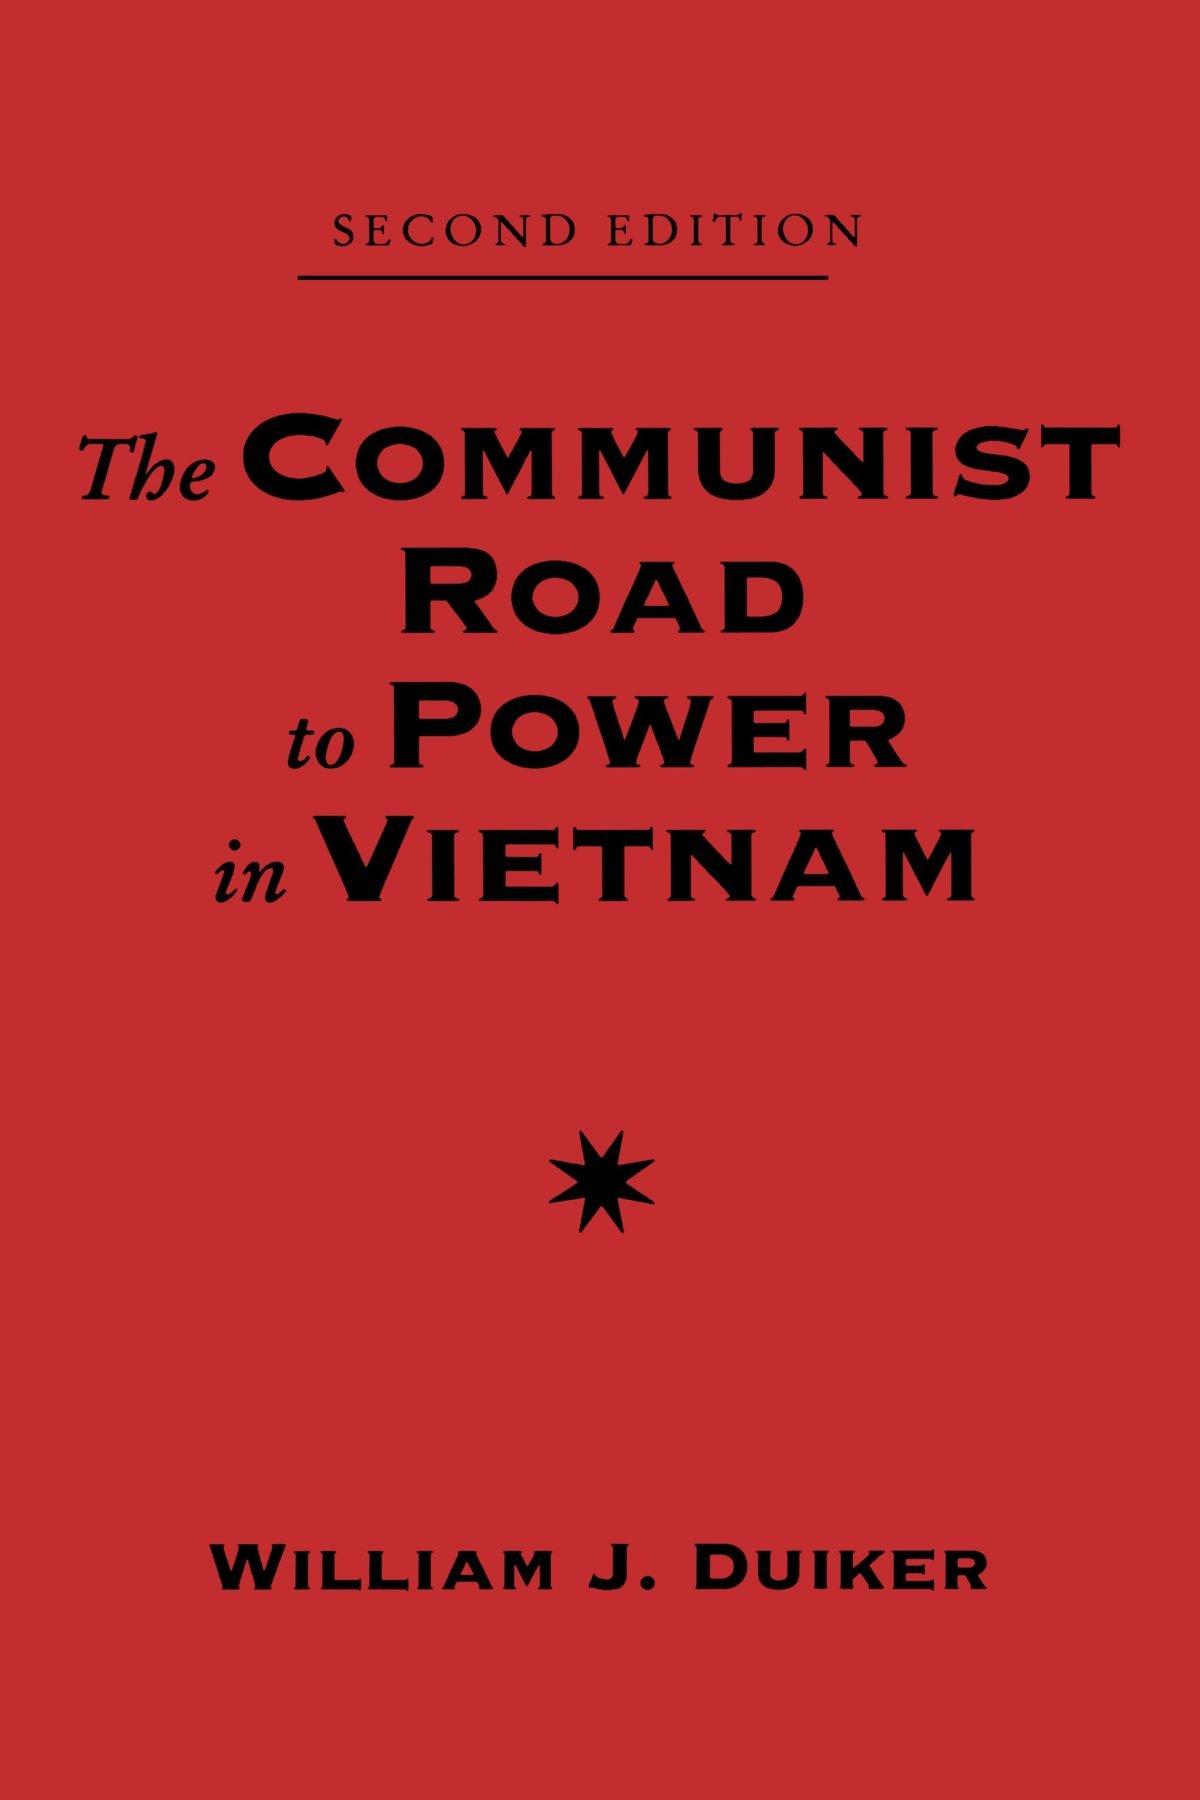 The Communist Road To Power In Vietnam: Second Edition Nations of the  Modern World : Asia: Amazon.de: Duiker, William J: Fremdsprachige Bücher